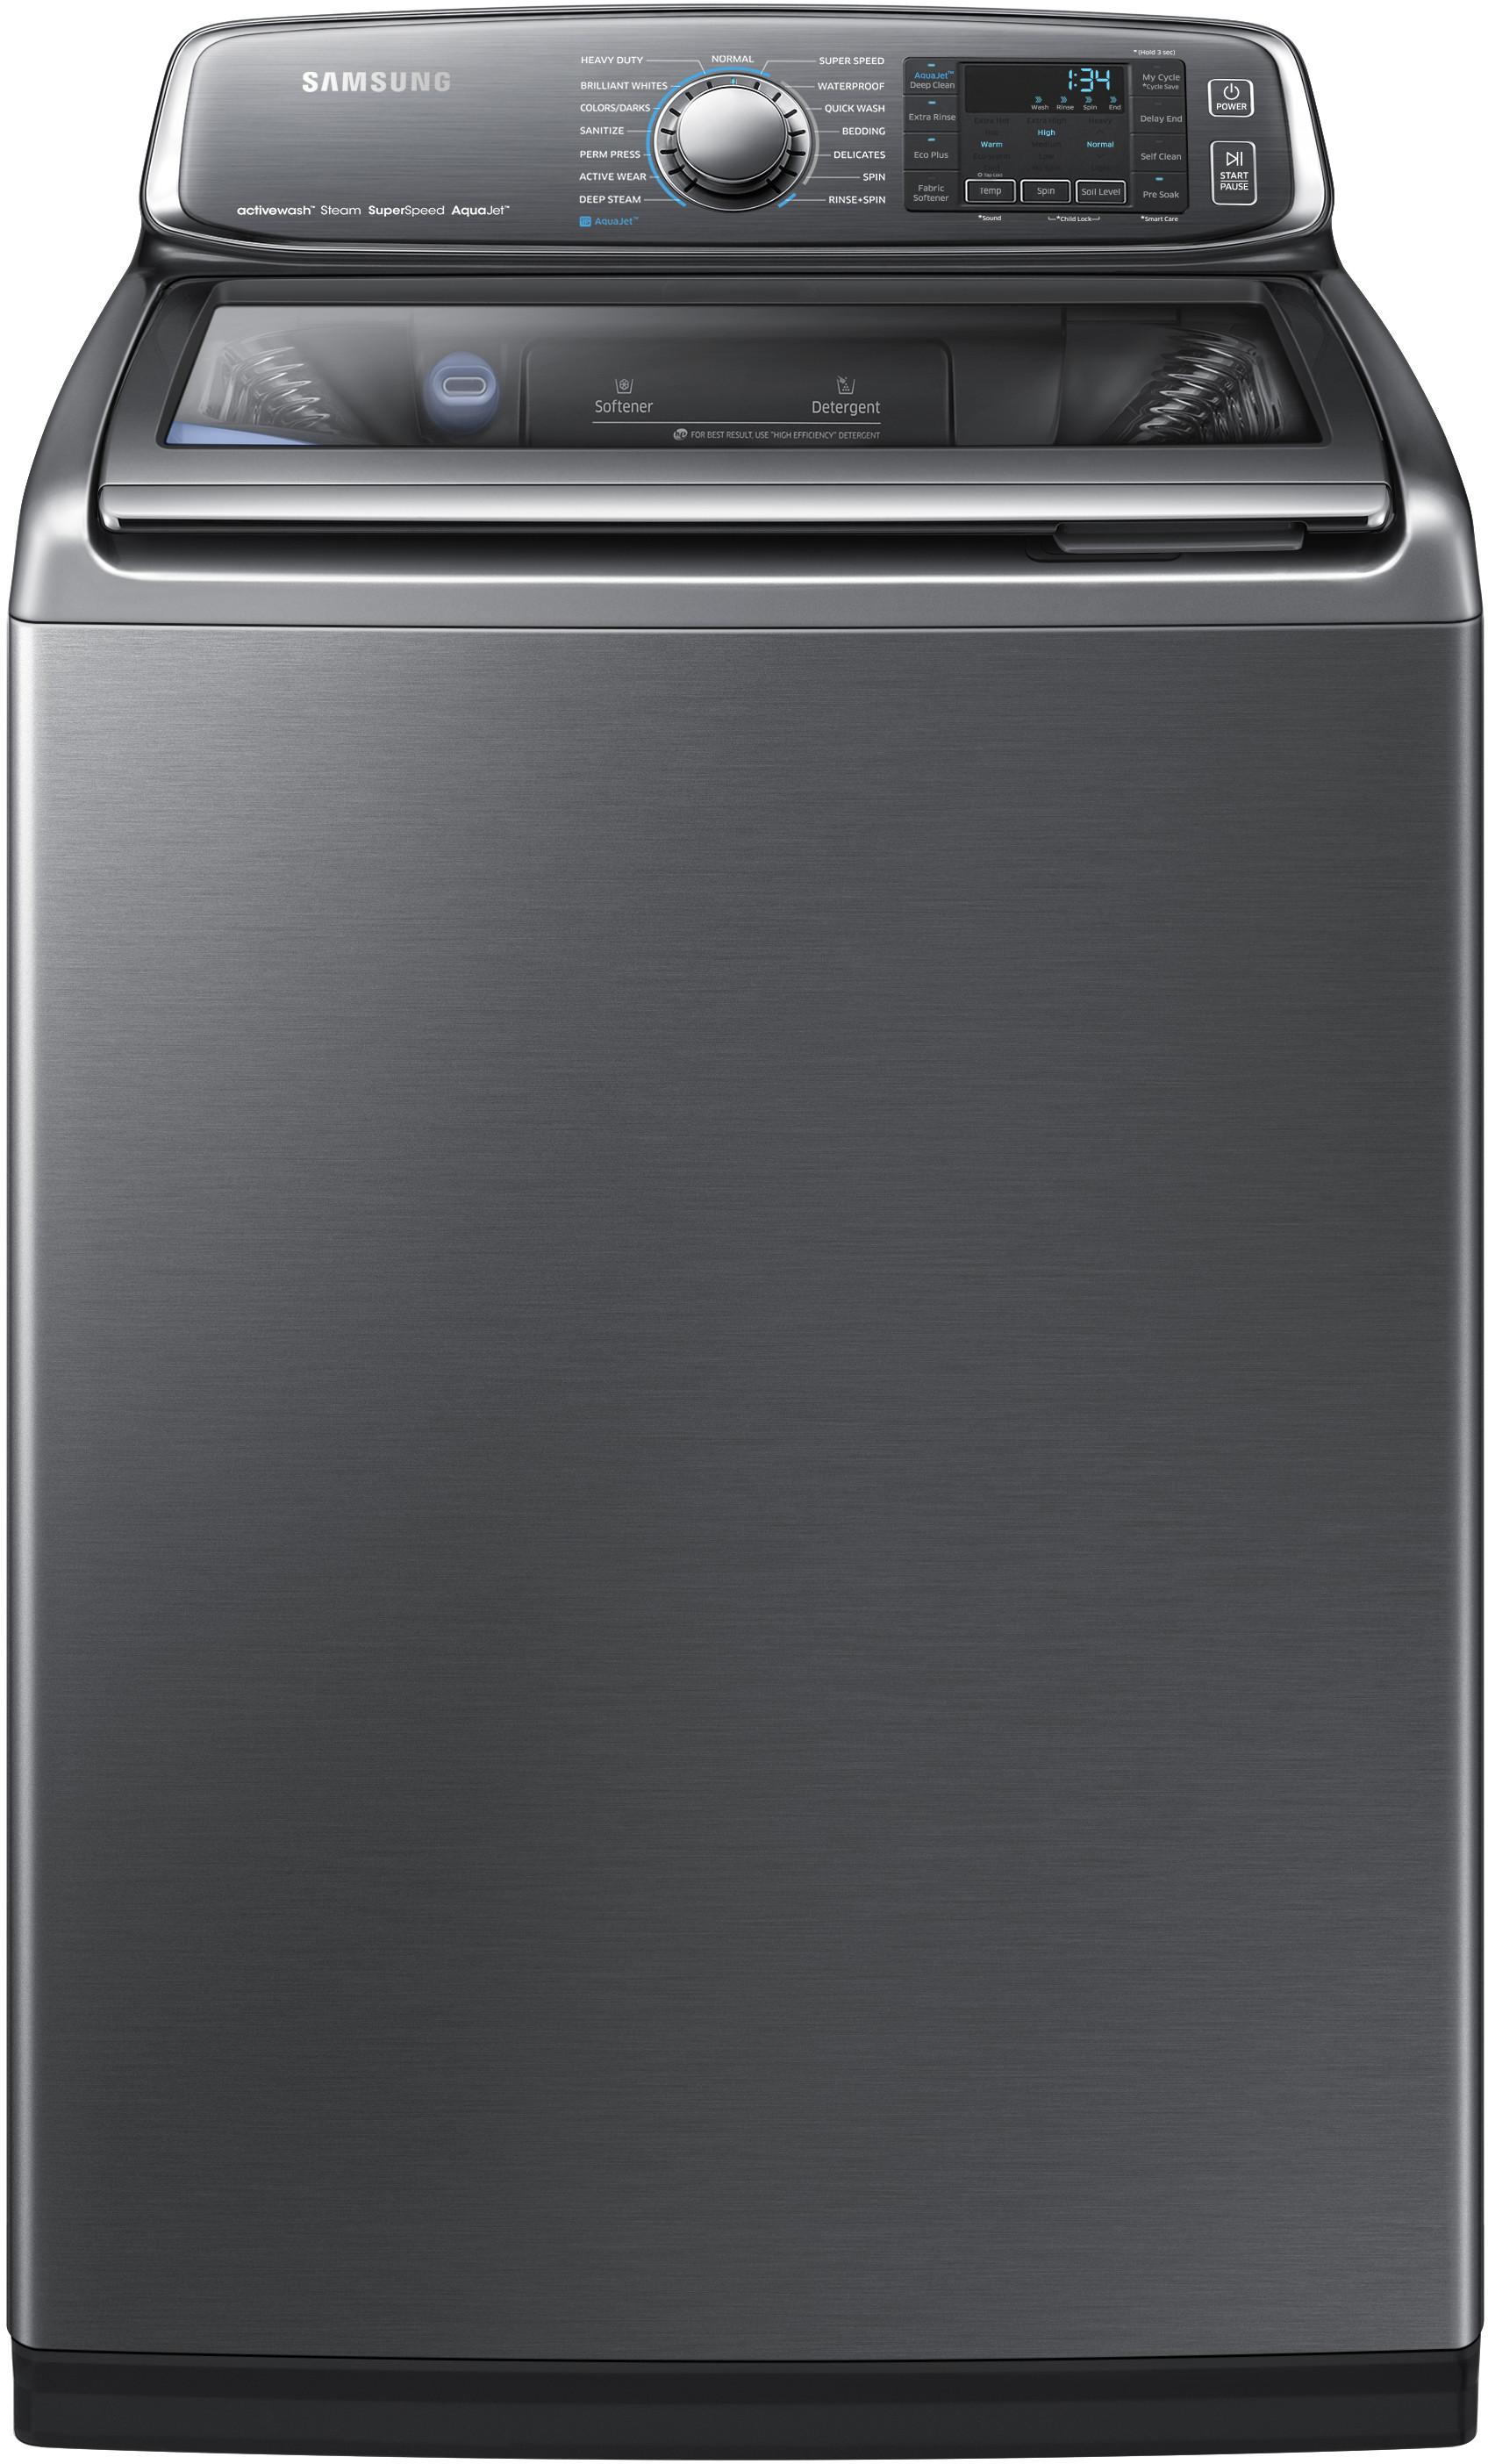 Samsung Wa52j8700ap 27 Inch 5 2 Cu Ft Top Load Washer